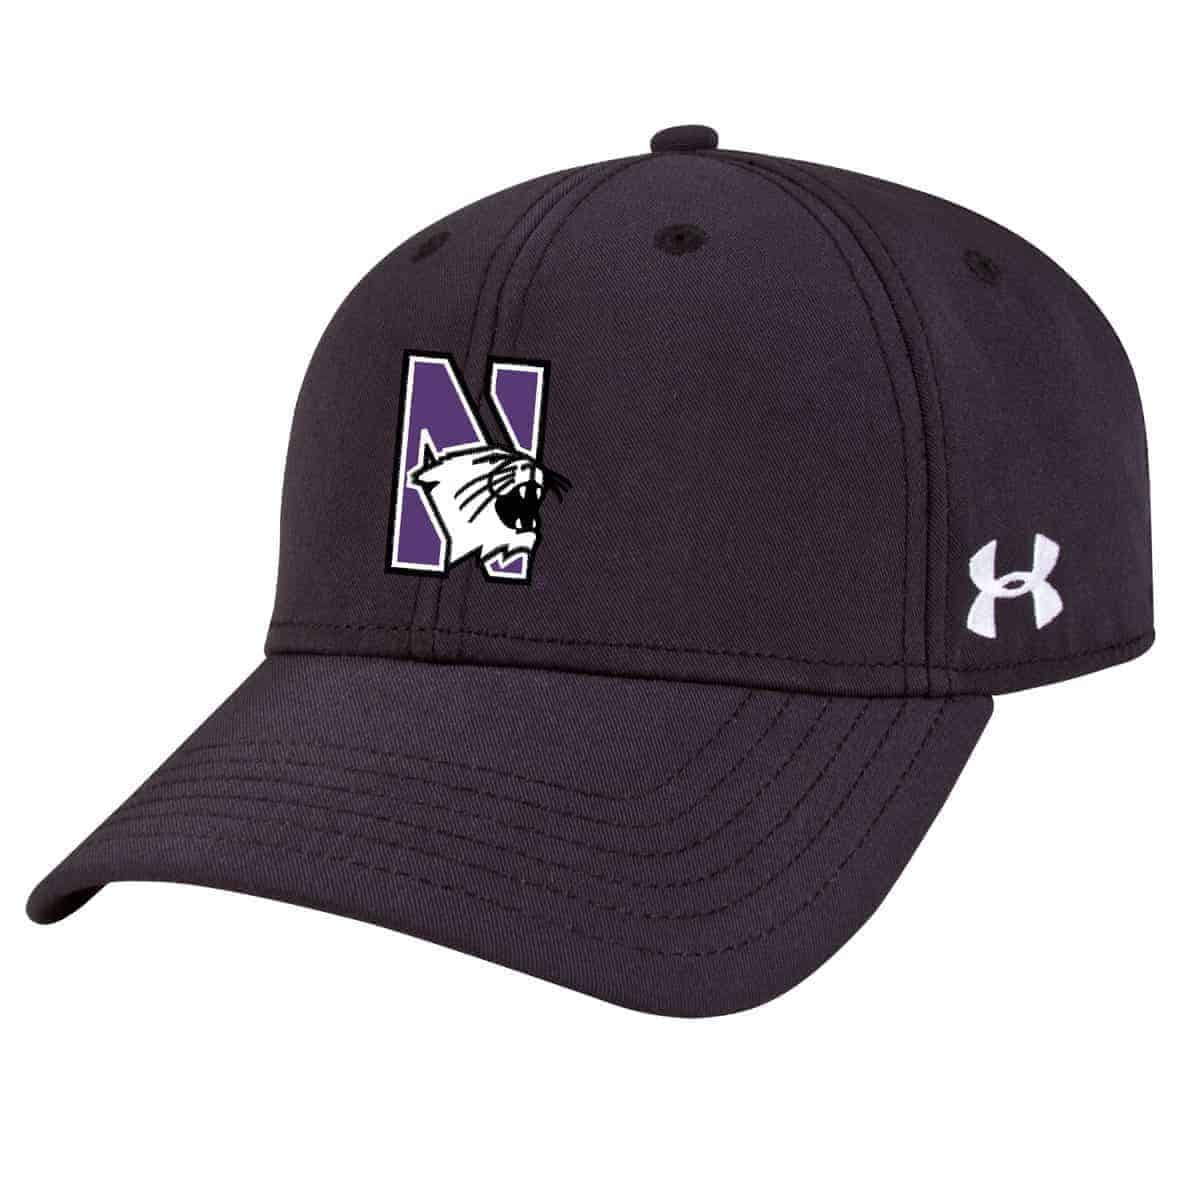 fefc062b946 Northwestern Wildcats Under Armour Black Adjustable Velcro-back Hat with N-Cat  Design